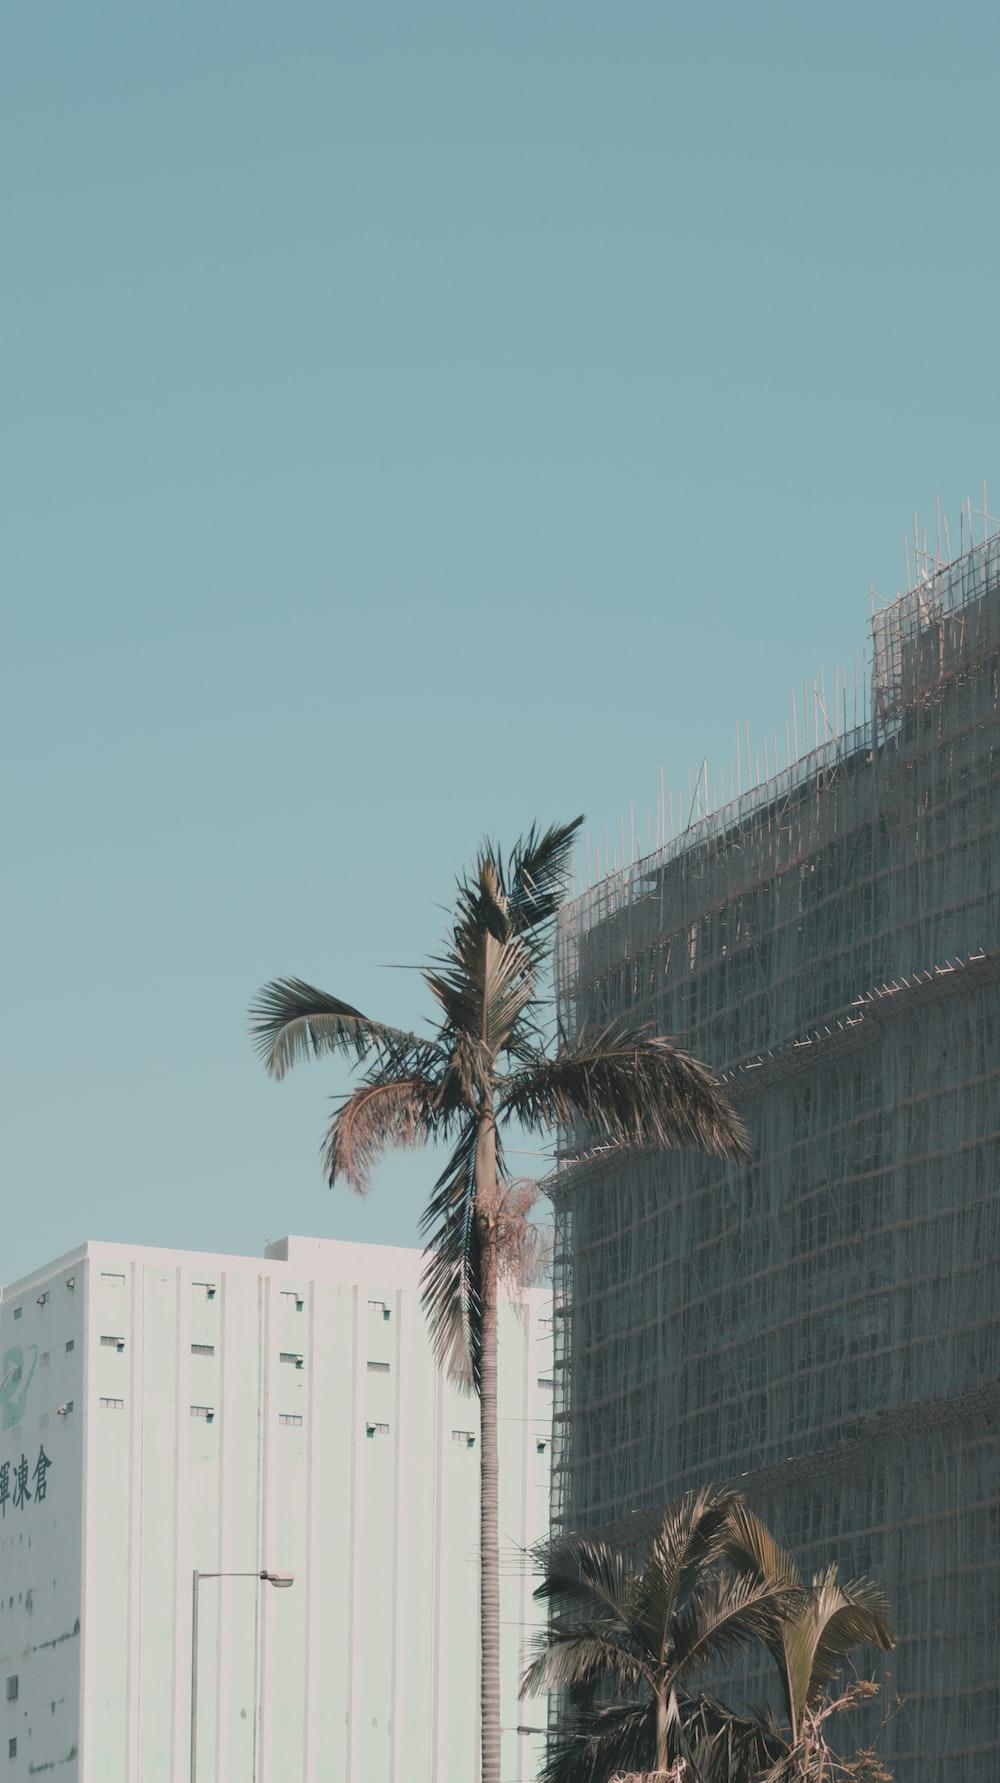 coconut tree near building